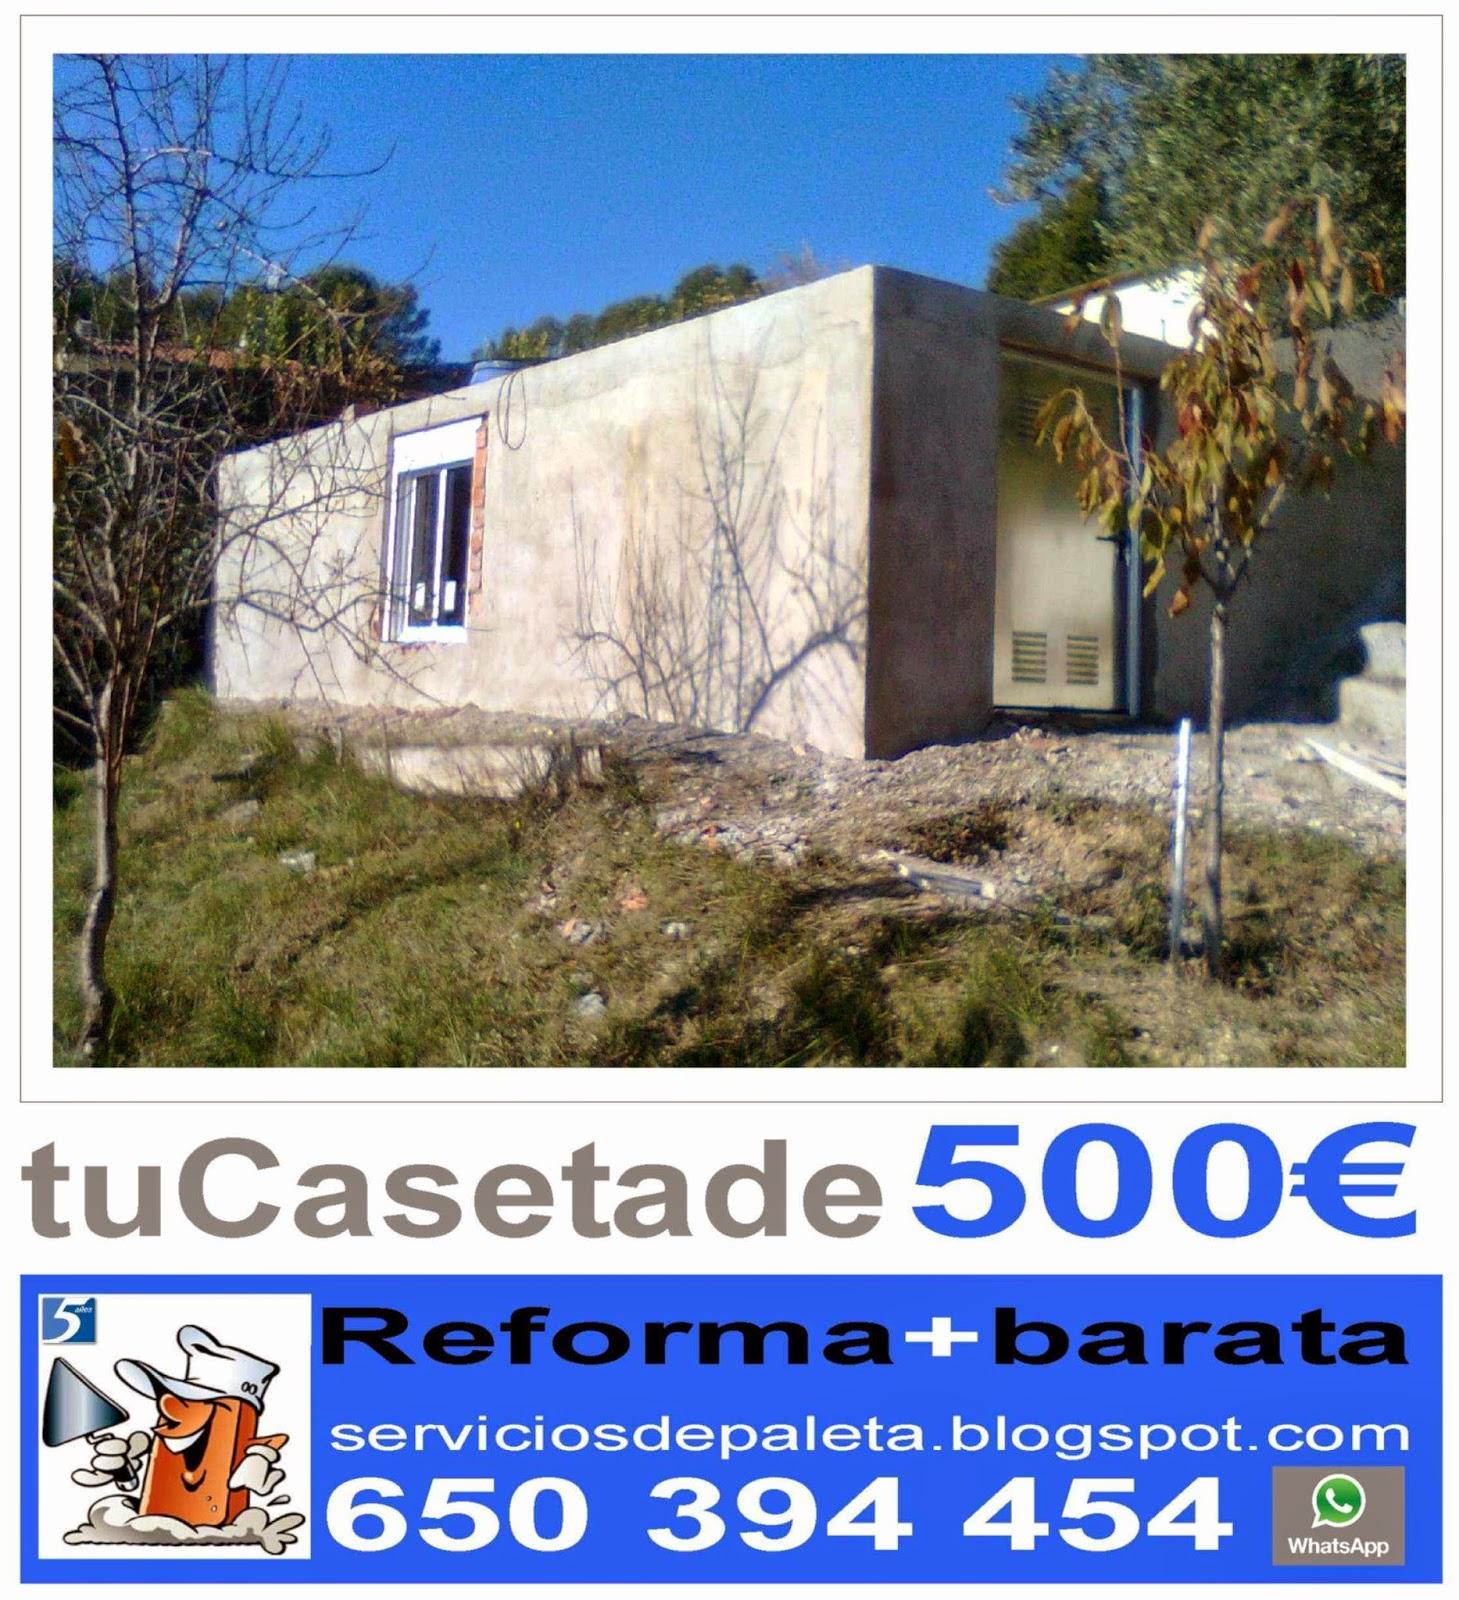 Serviciosdejardineriabasica jardineria barata tucasetade500 for Jardineria barata barcelona